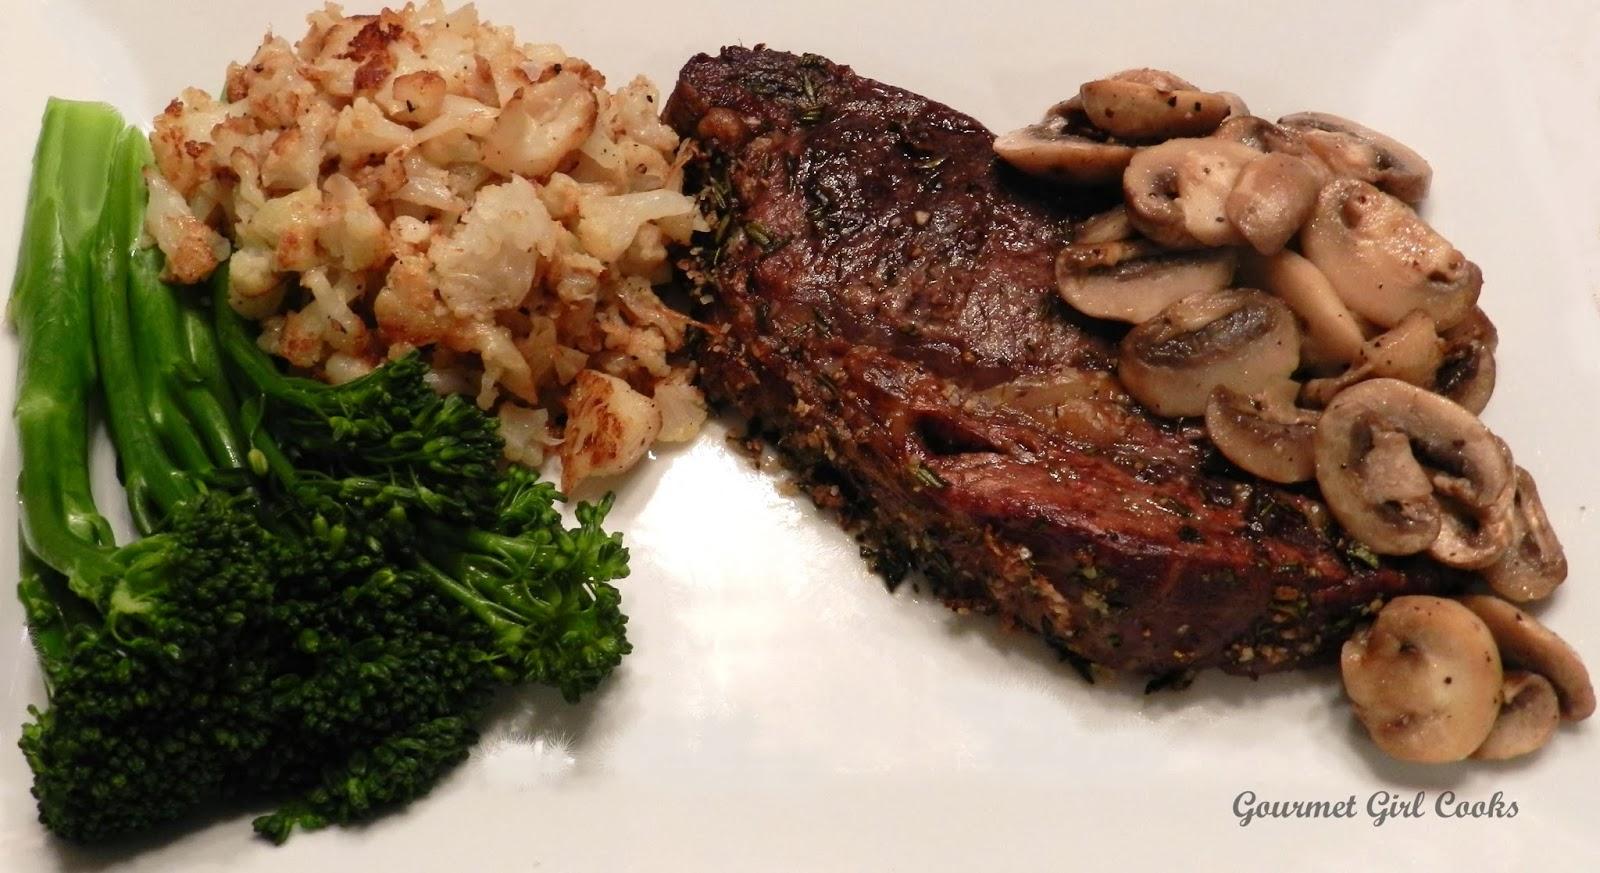 Gourmet Girl Cooks: Herb Crusted Boneless Rib Eye Roast